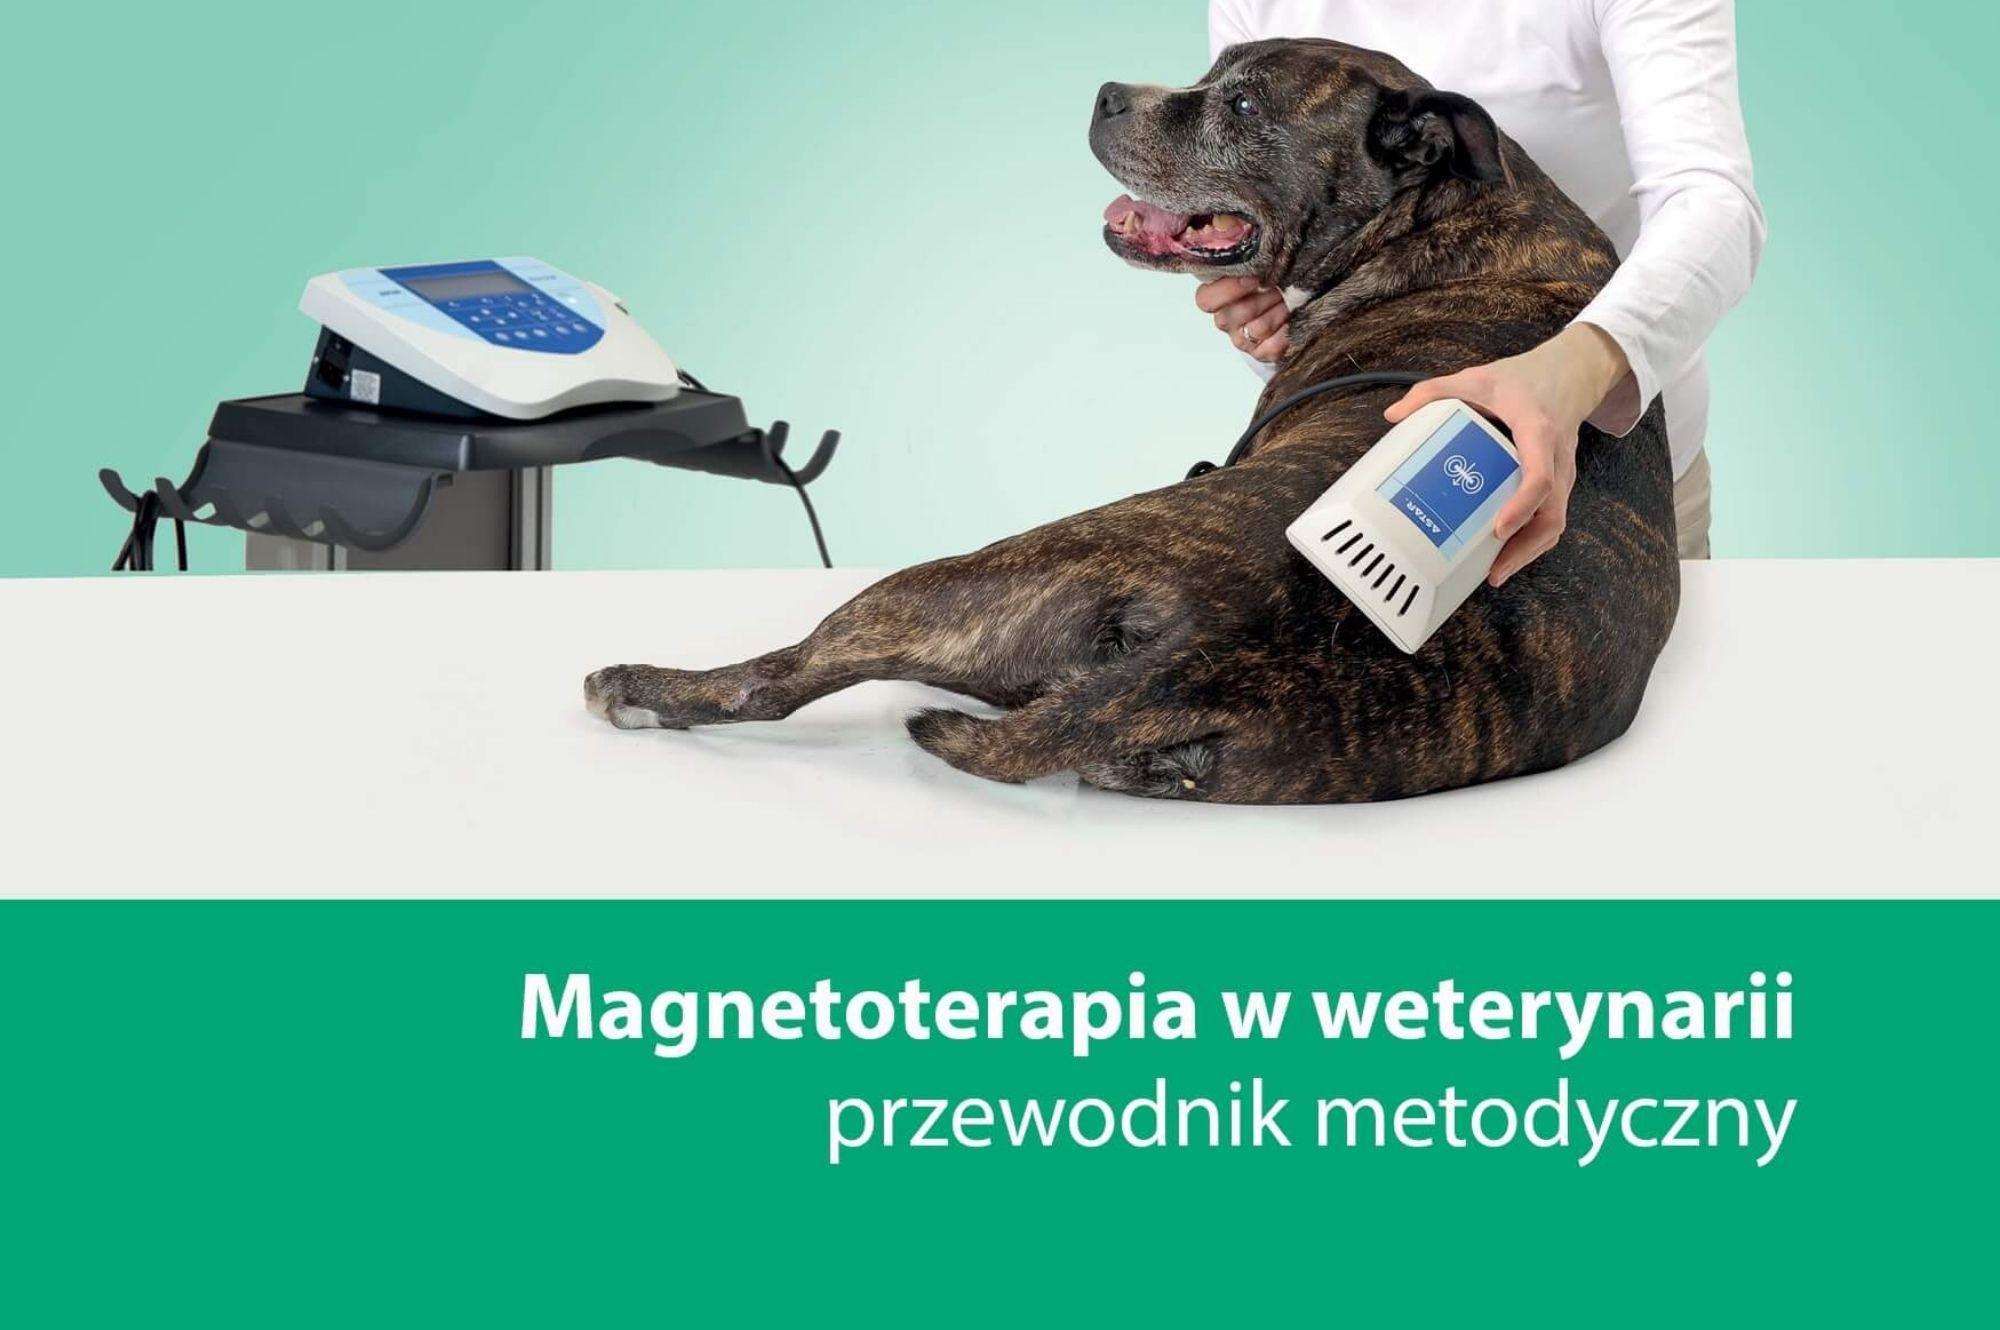 magnetoterapia w weterynarii